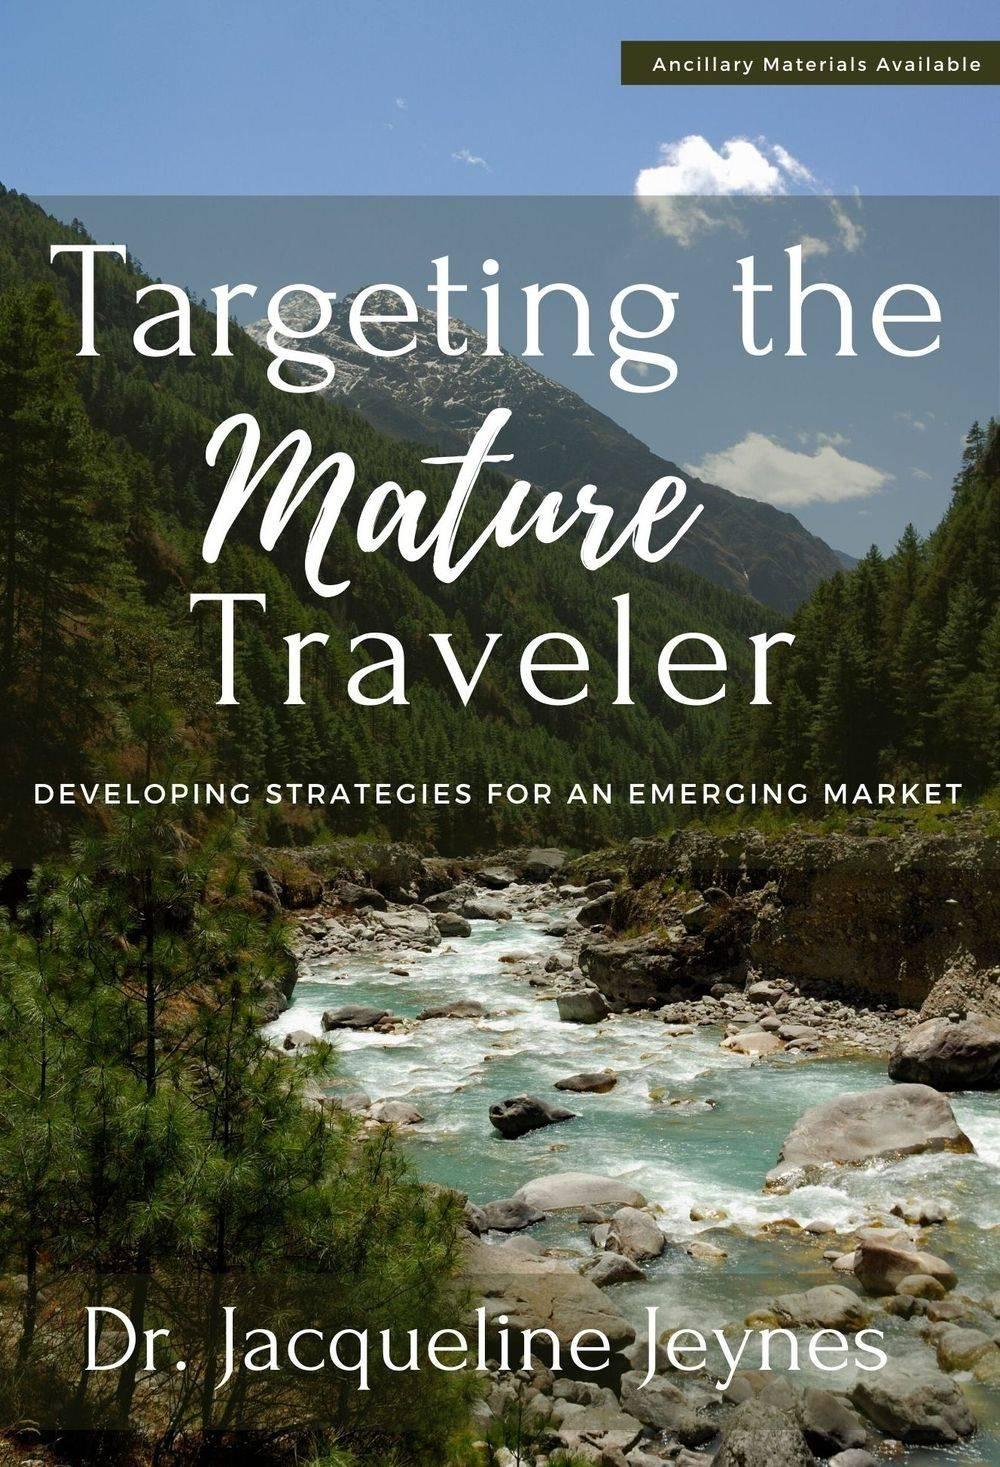 Targeting the mature traveler